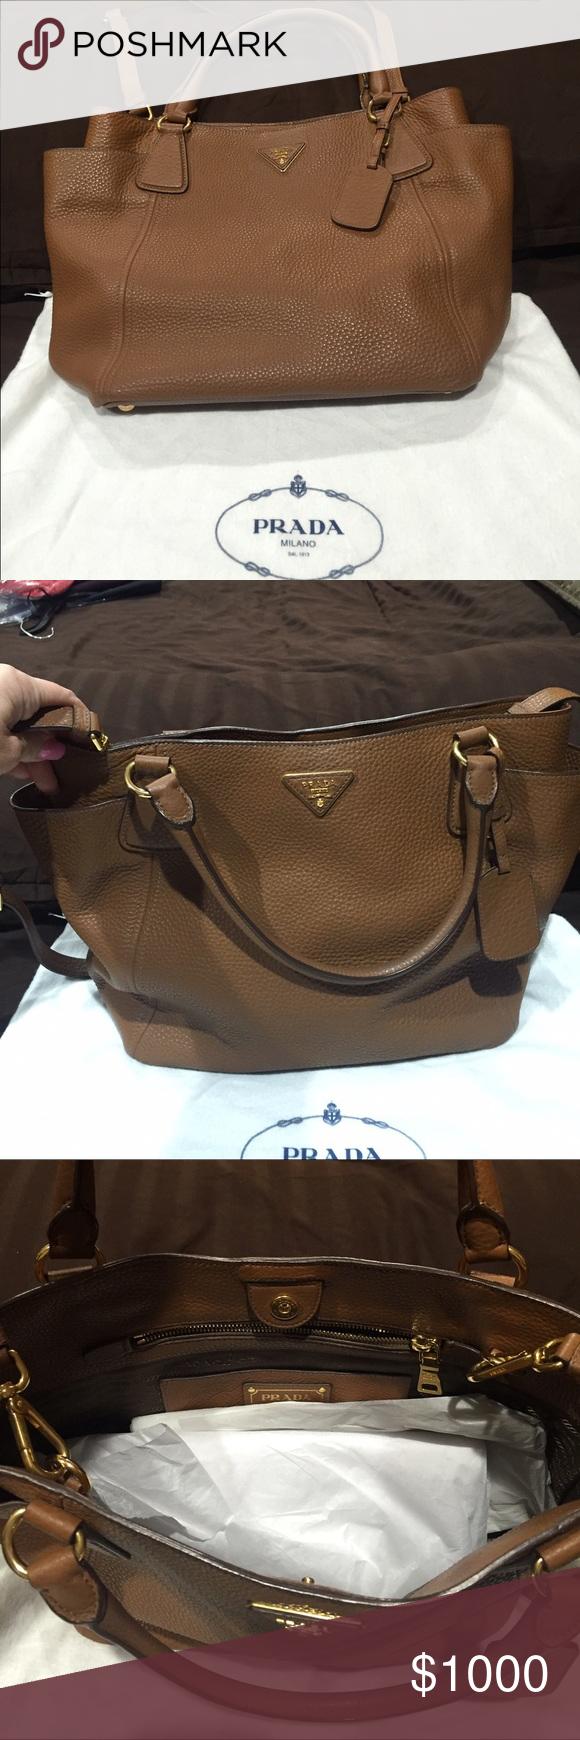 Prada Diano Beautiful Prada  satchel & crossbody never been used!!! No Trades please! Prada Bags Satchels